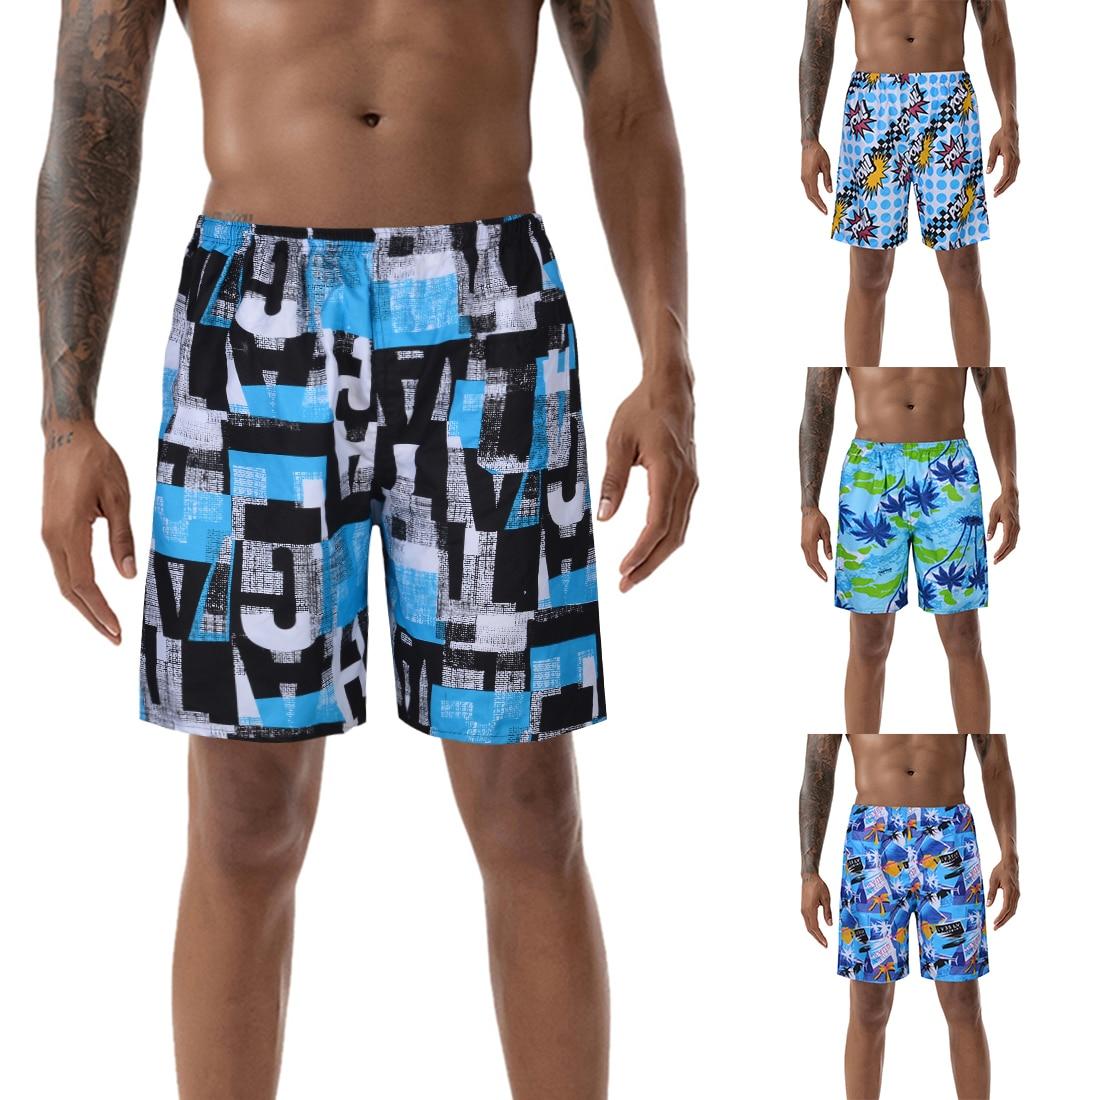 Domple Mens Elastic Waist Summer Plus Size Swim Trunk Casual Camo Print Athletic Shorts